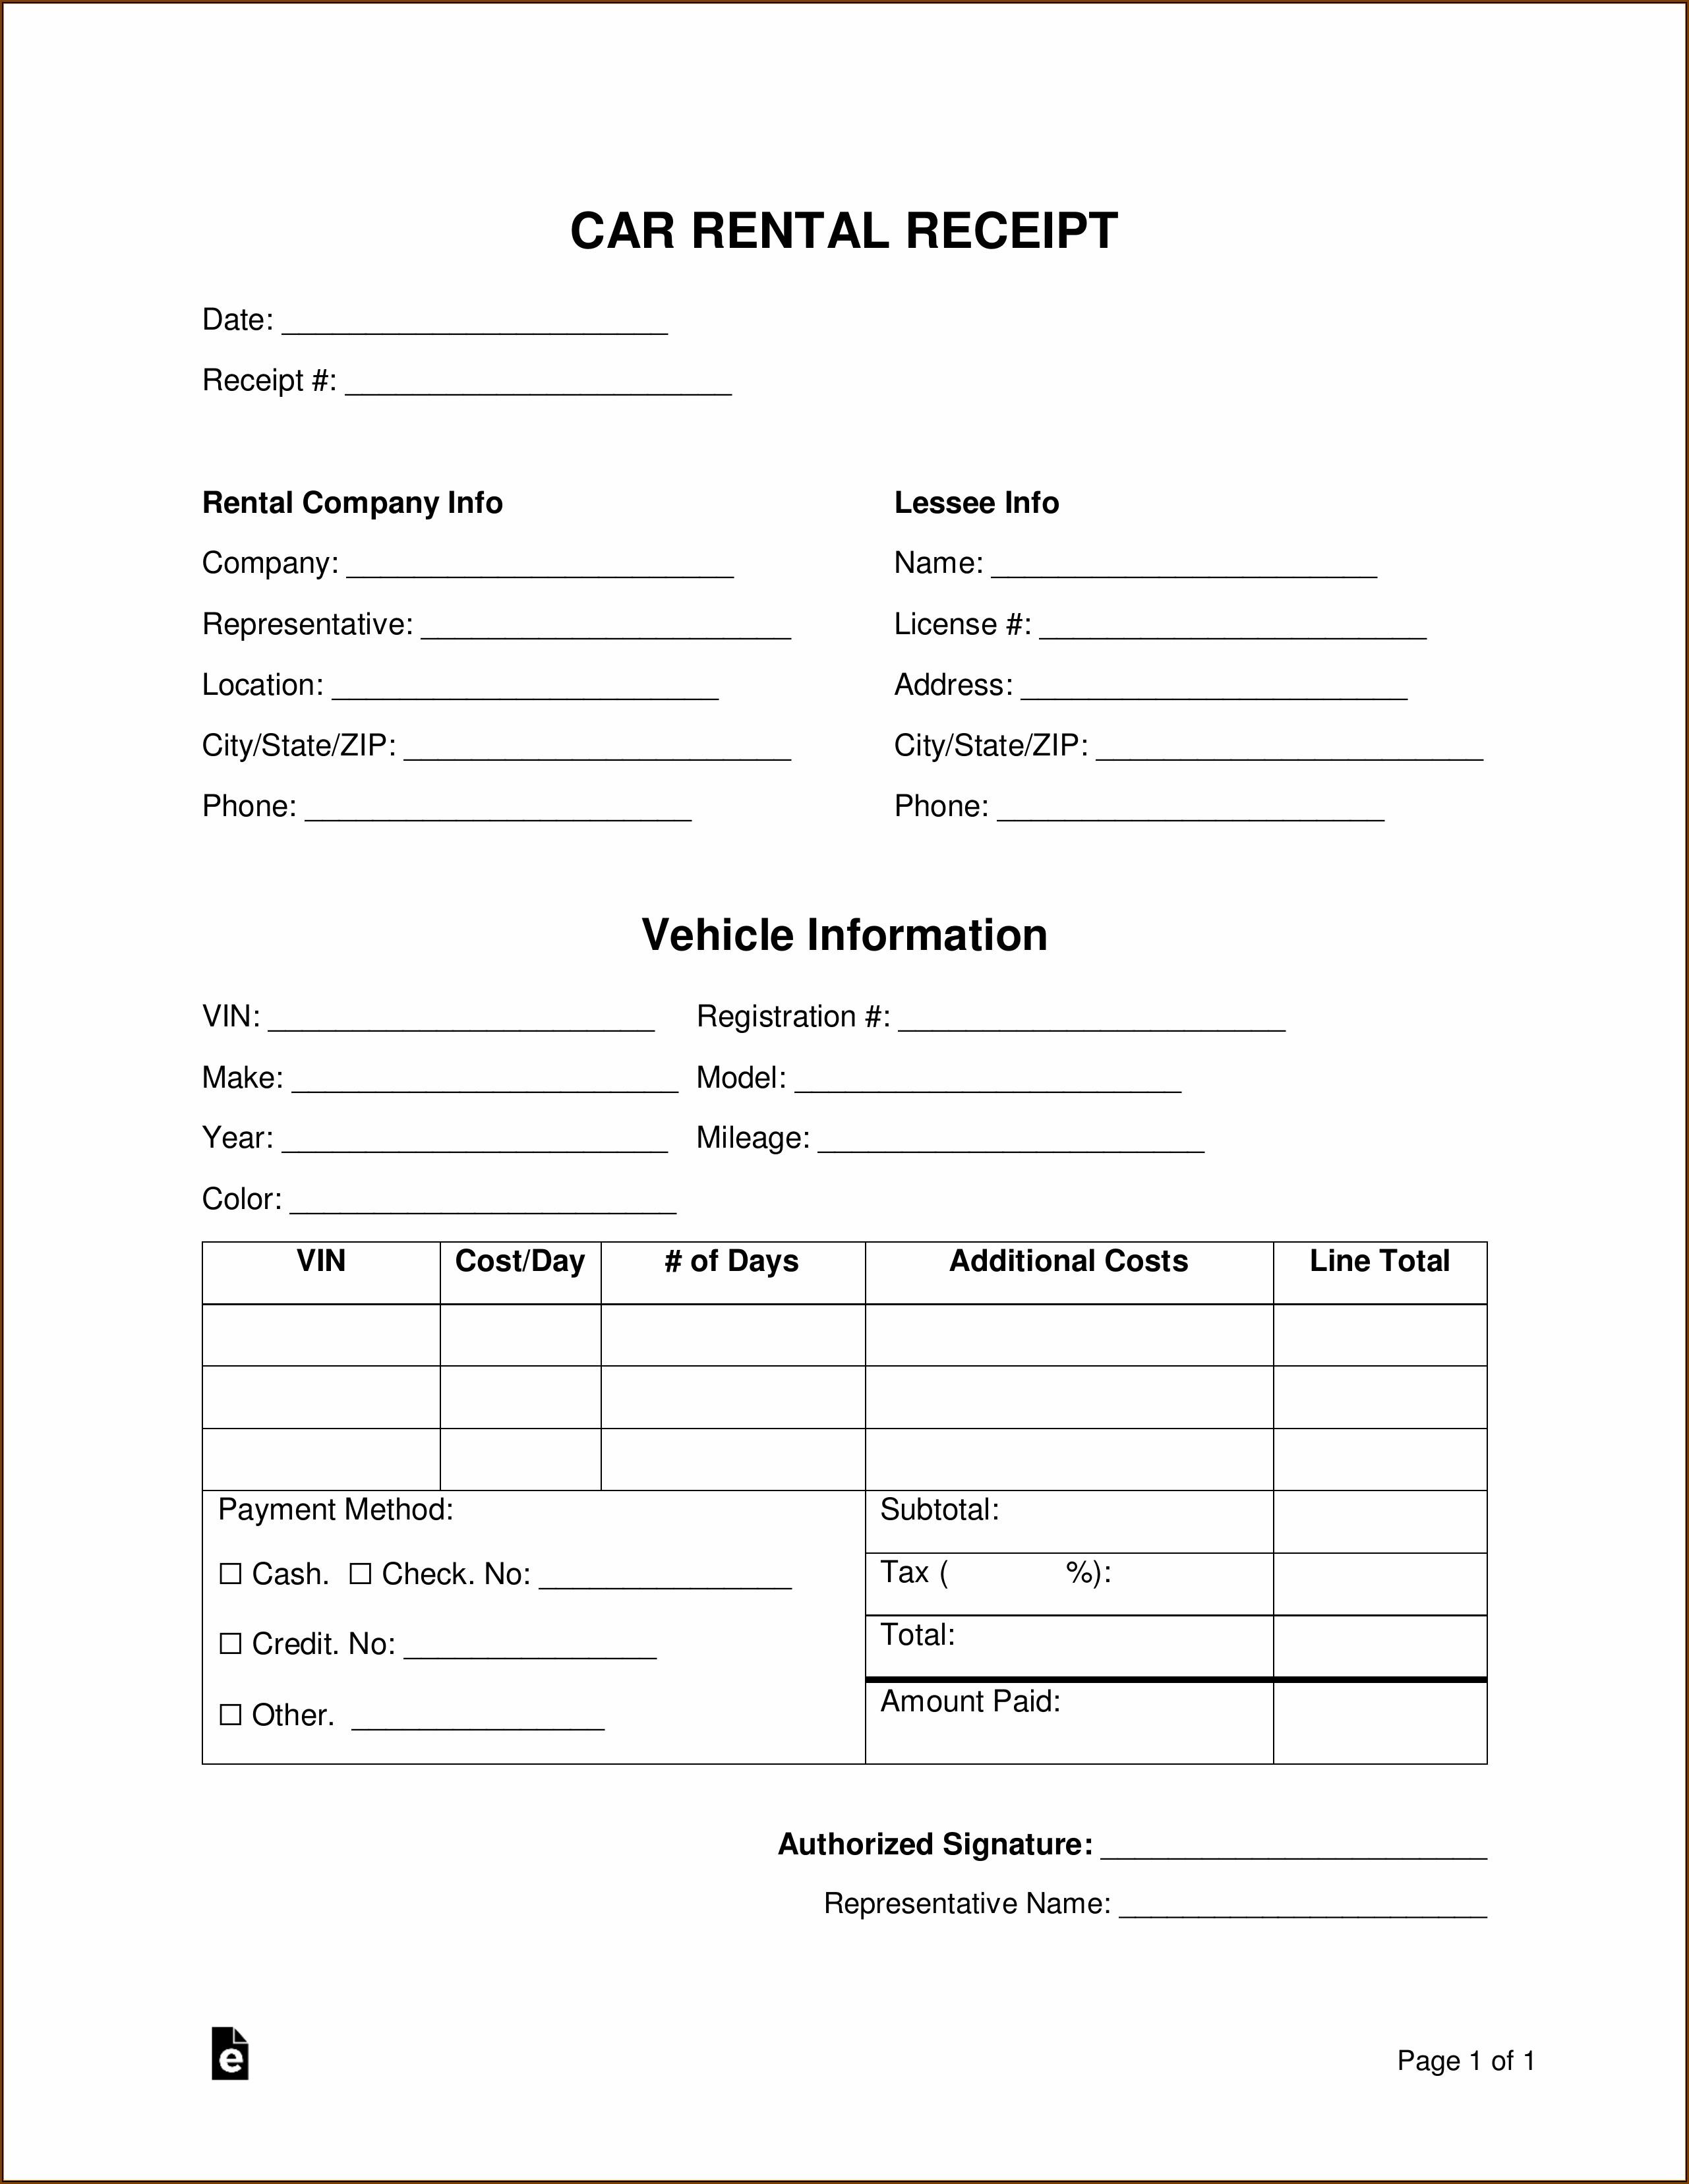 Car Rental Receipt Template Pdf